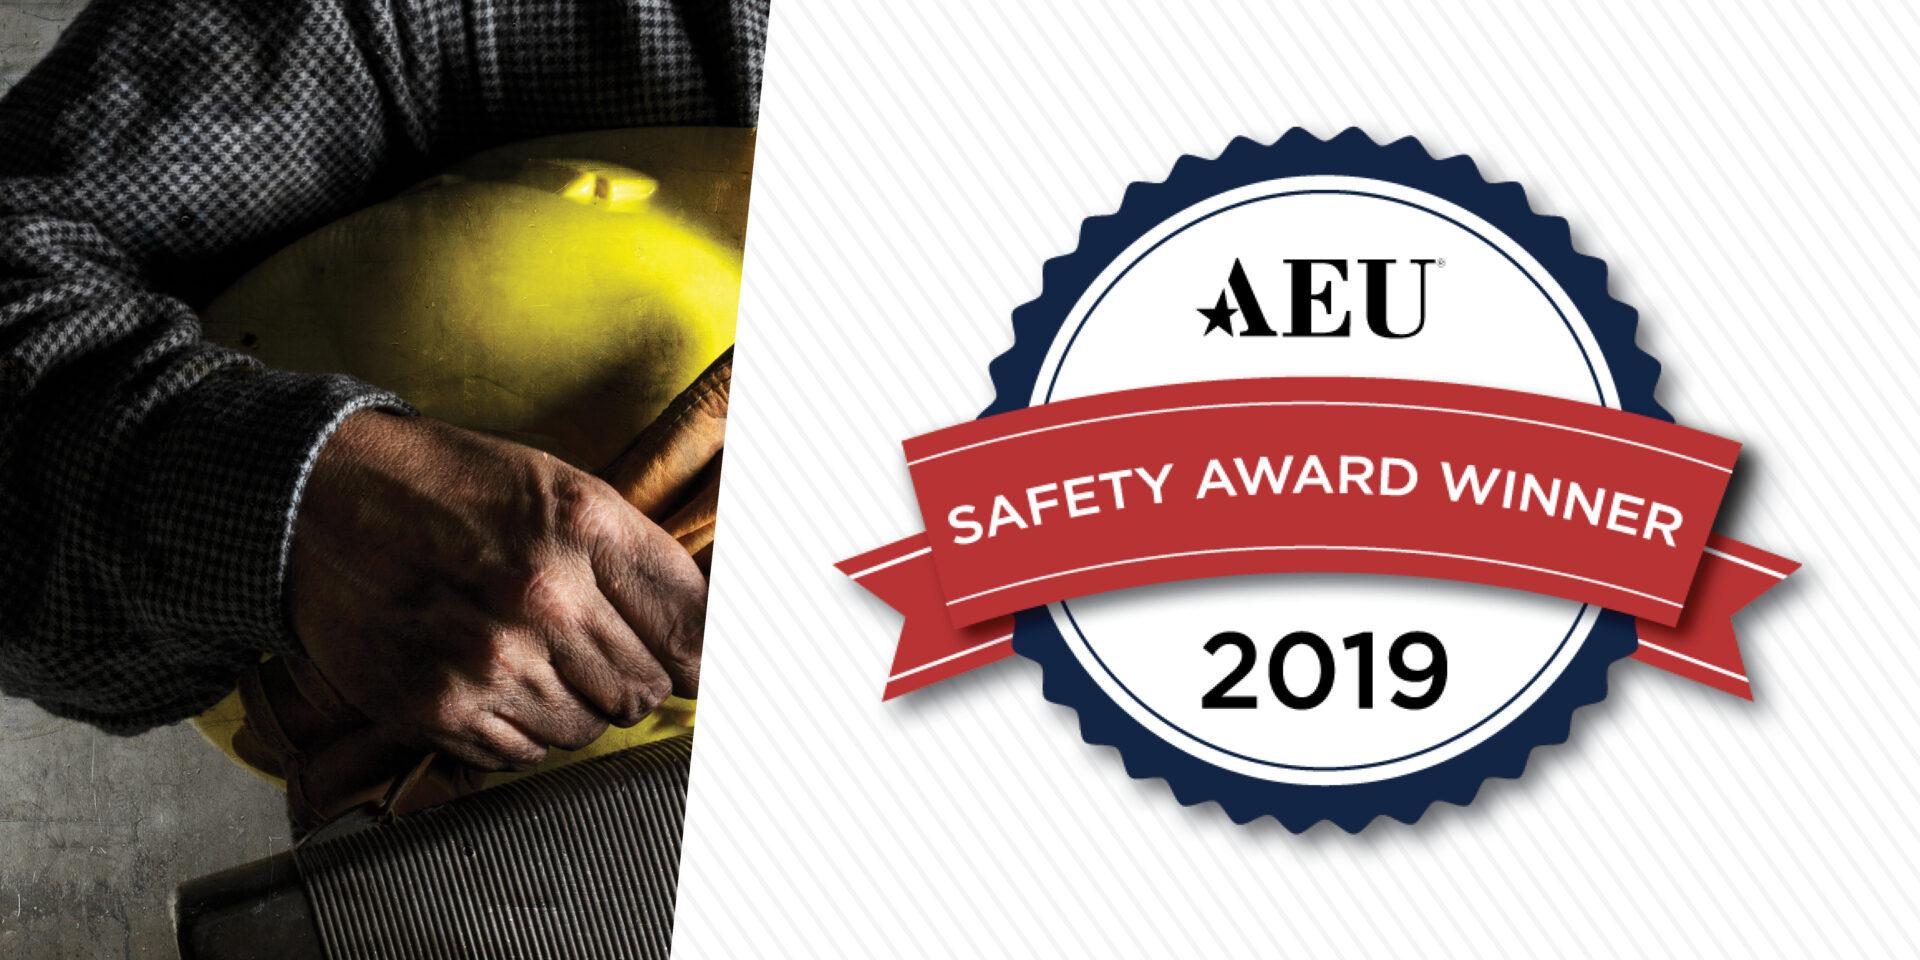 7. Template - Safety Award Winner Social Image